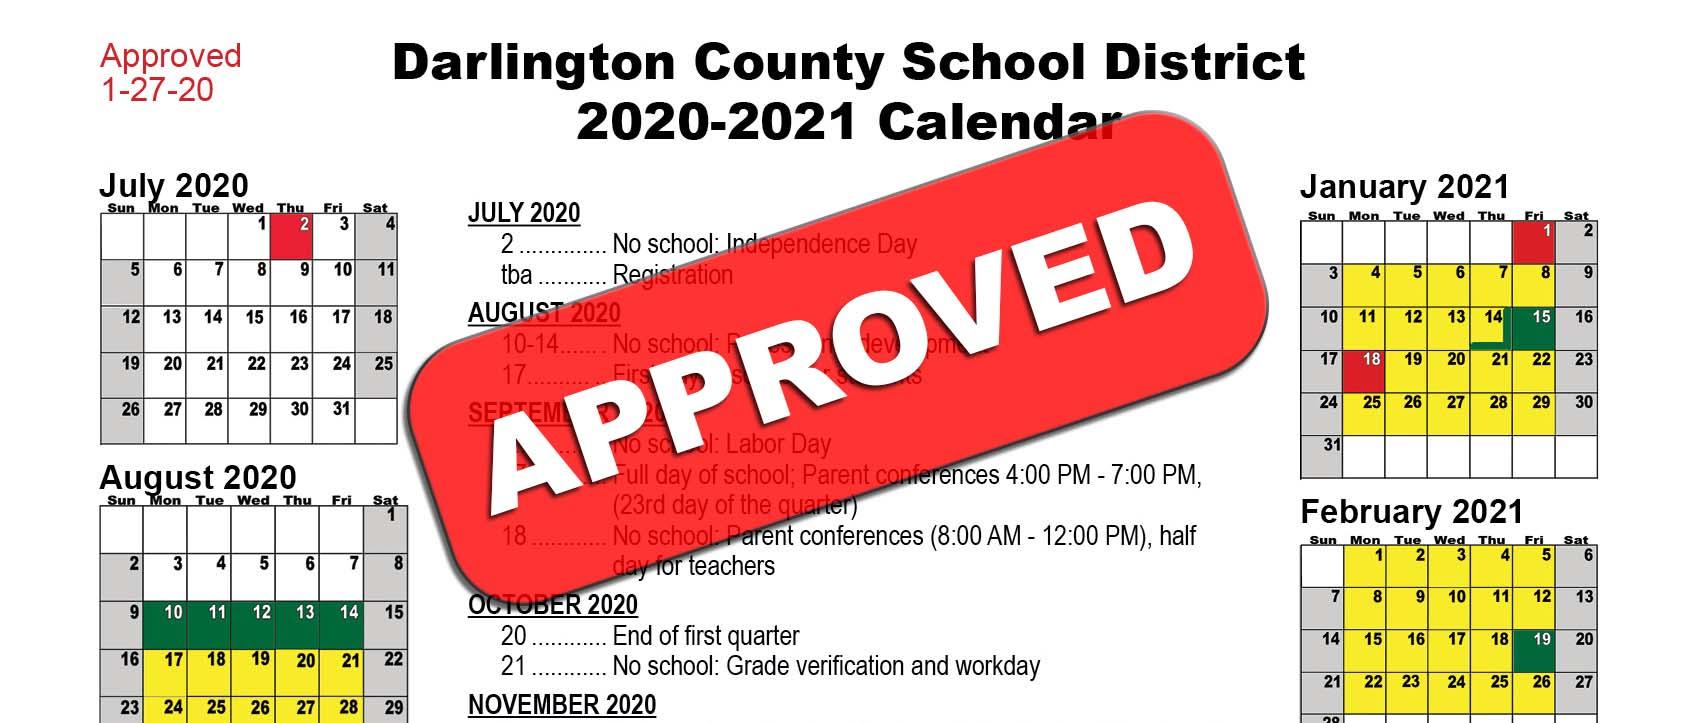 Board Of Education Approves 2020 2021 District Calendar In Miller Place School Calendar